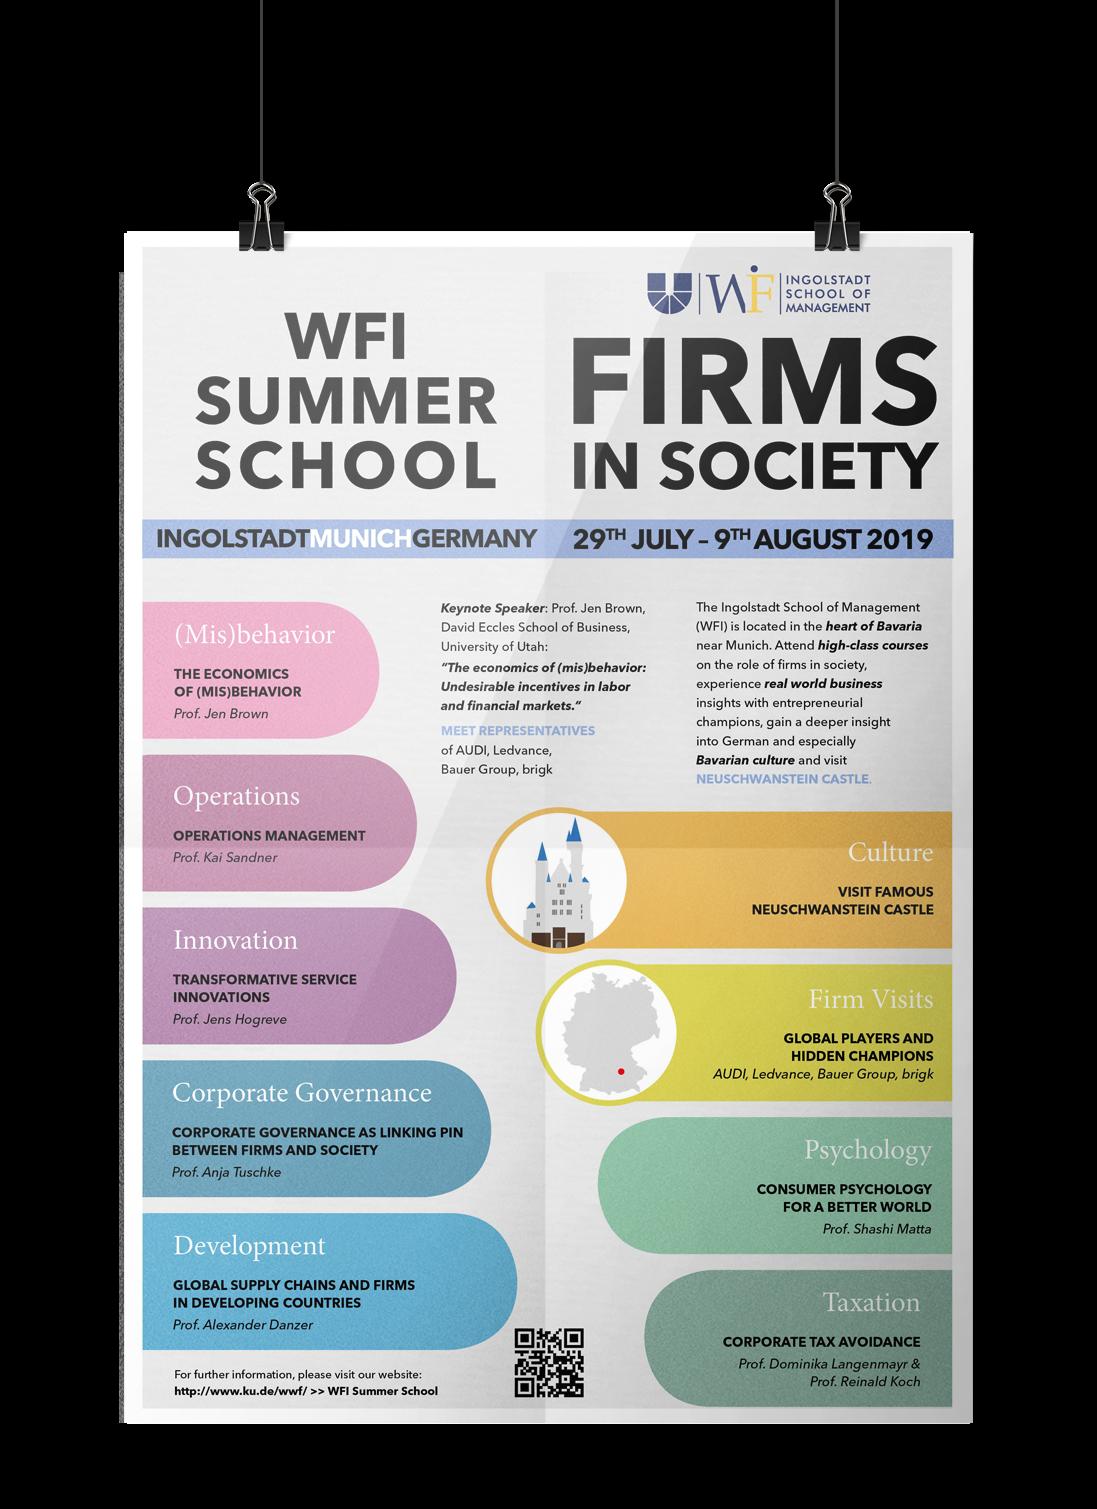 Plakatgestaltung, Kunde: WFI, Universität Ingolstadt